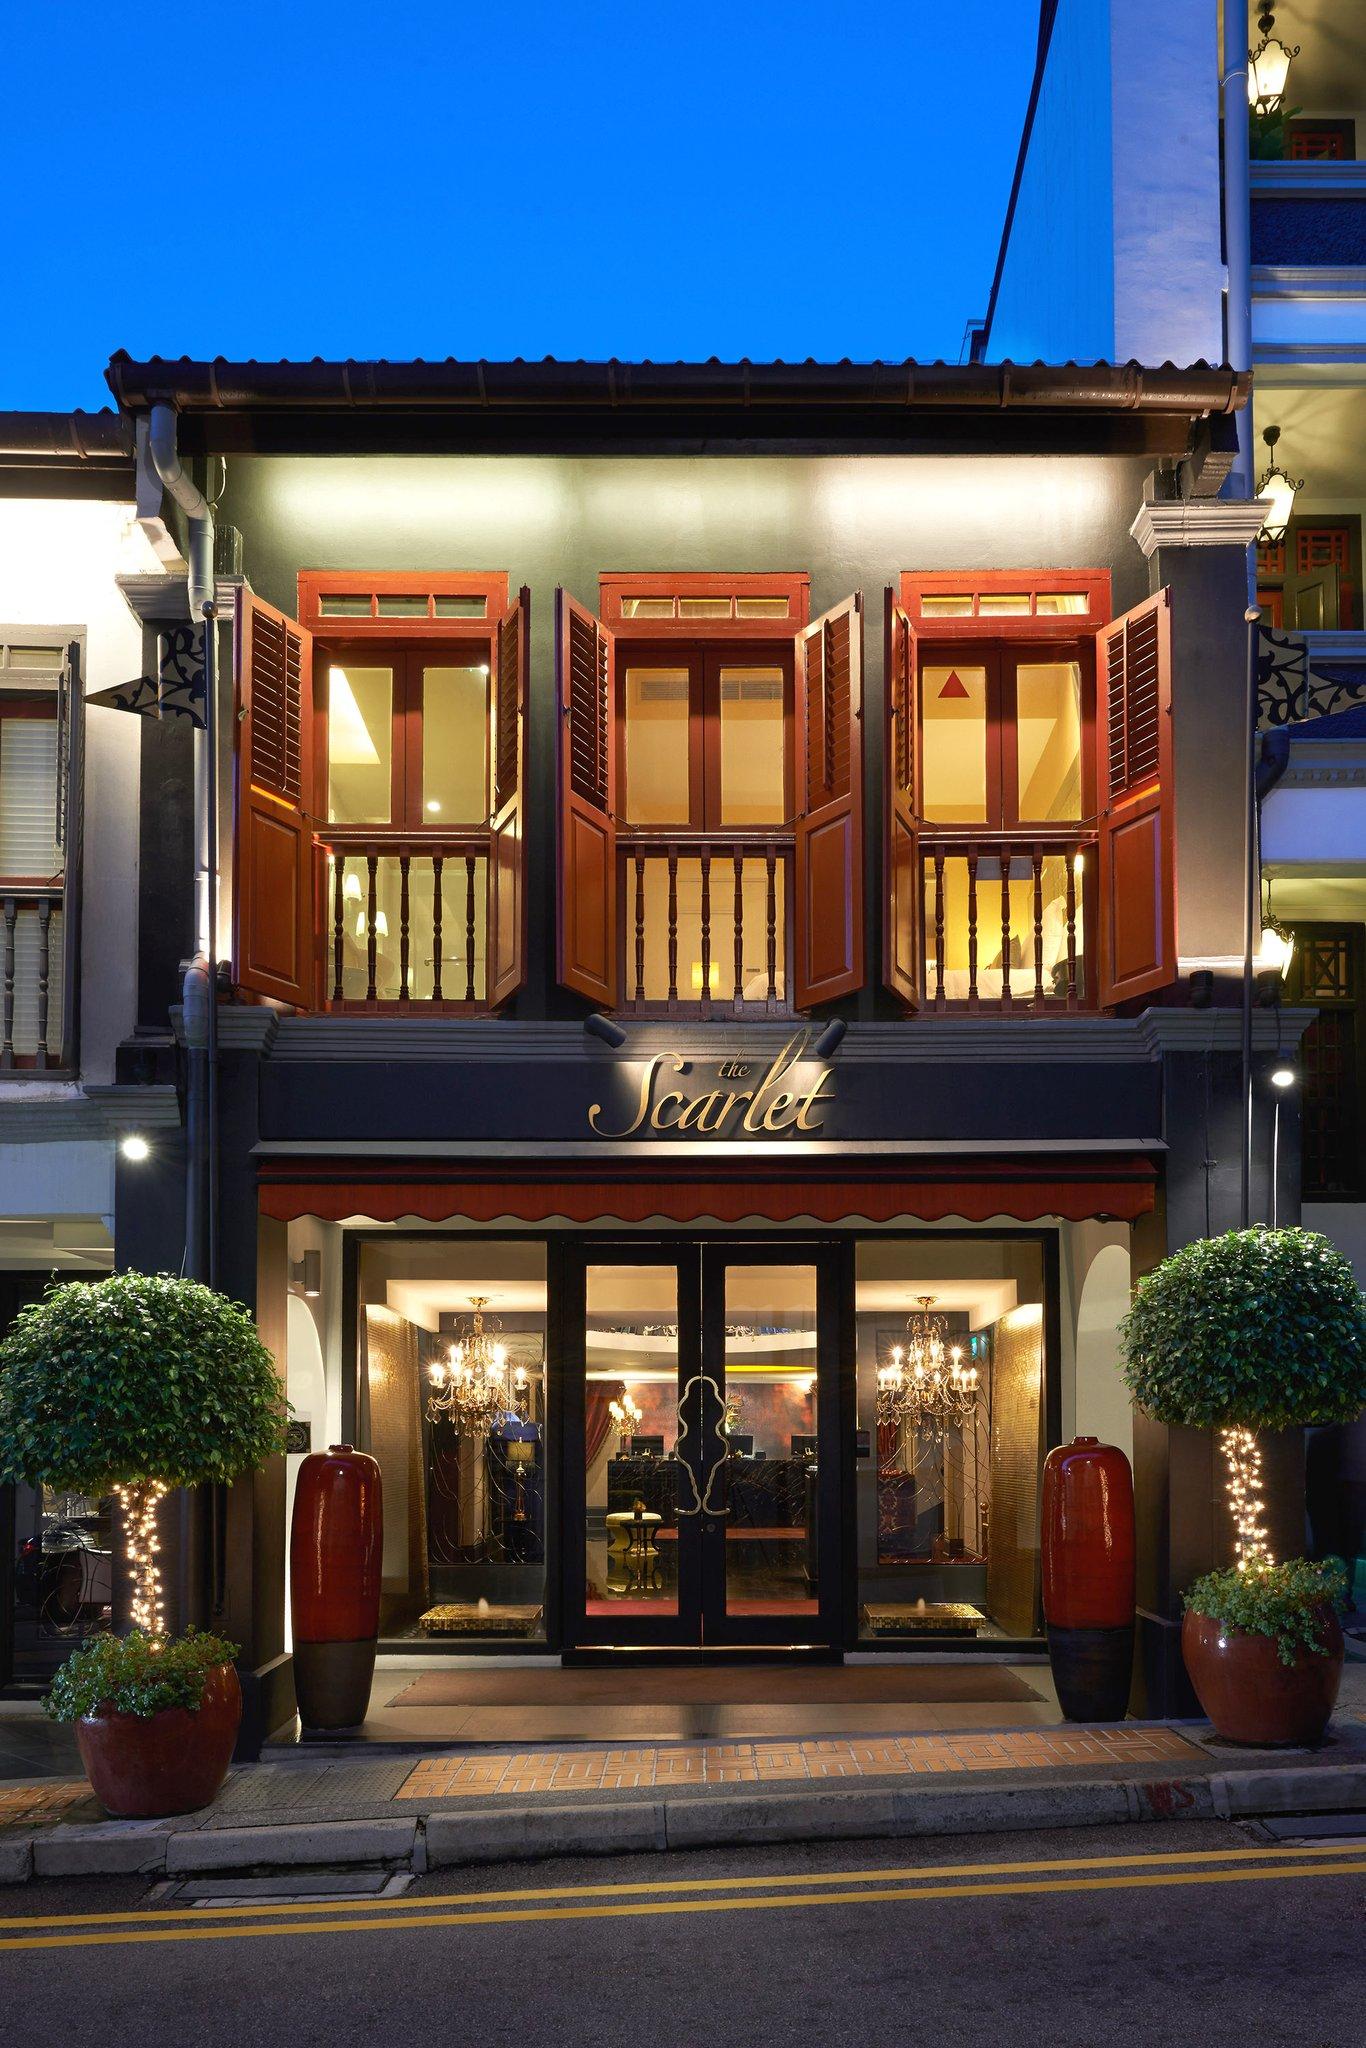 2._Hotel_Entrance_S.jpg